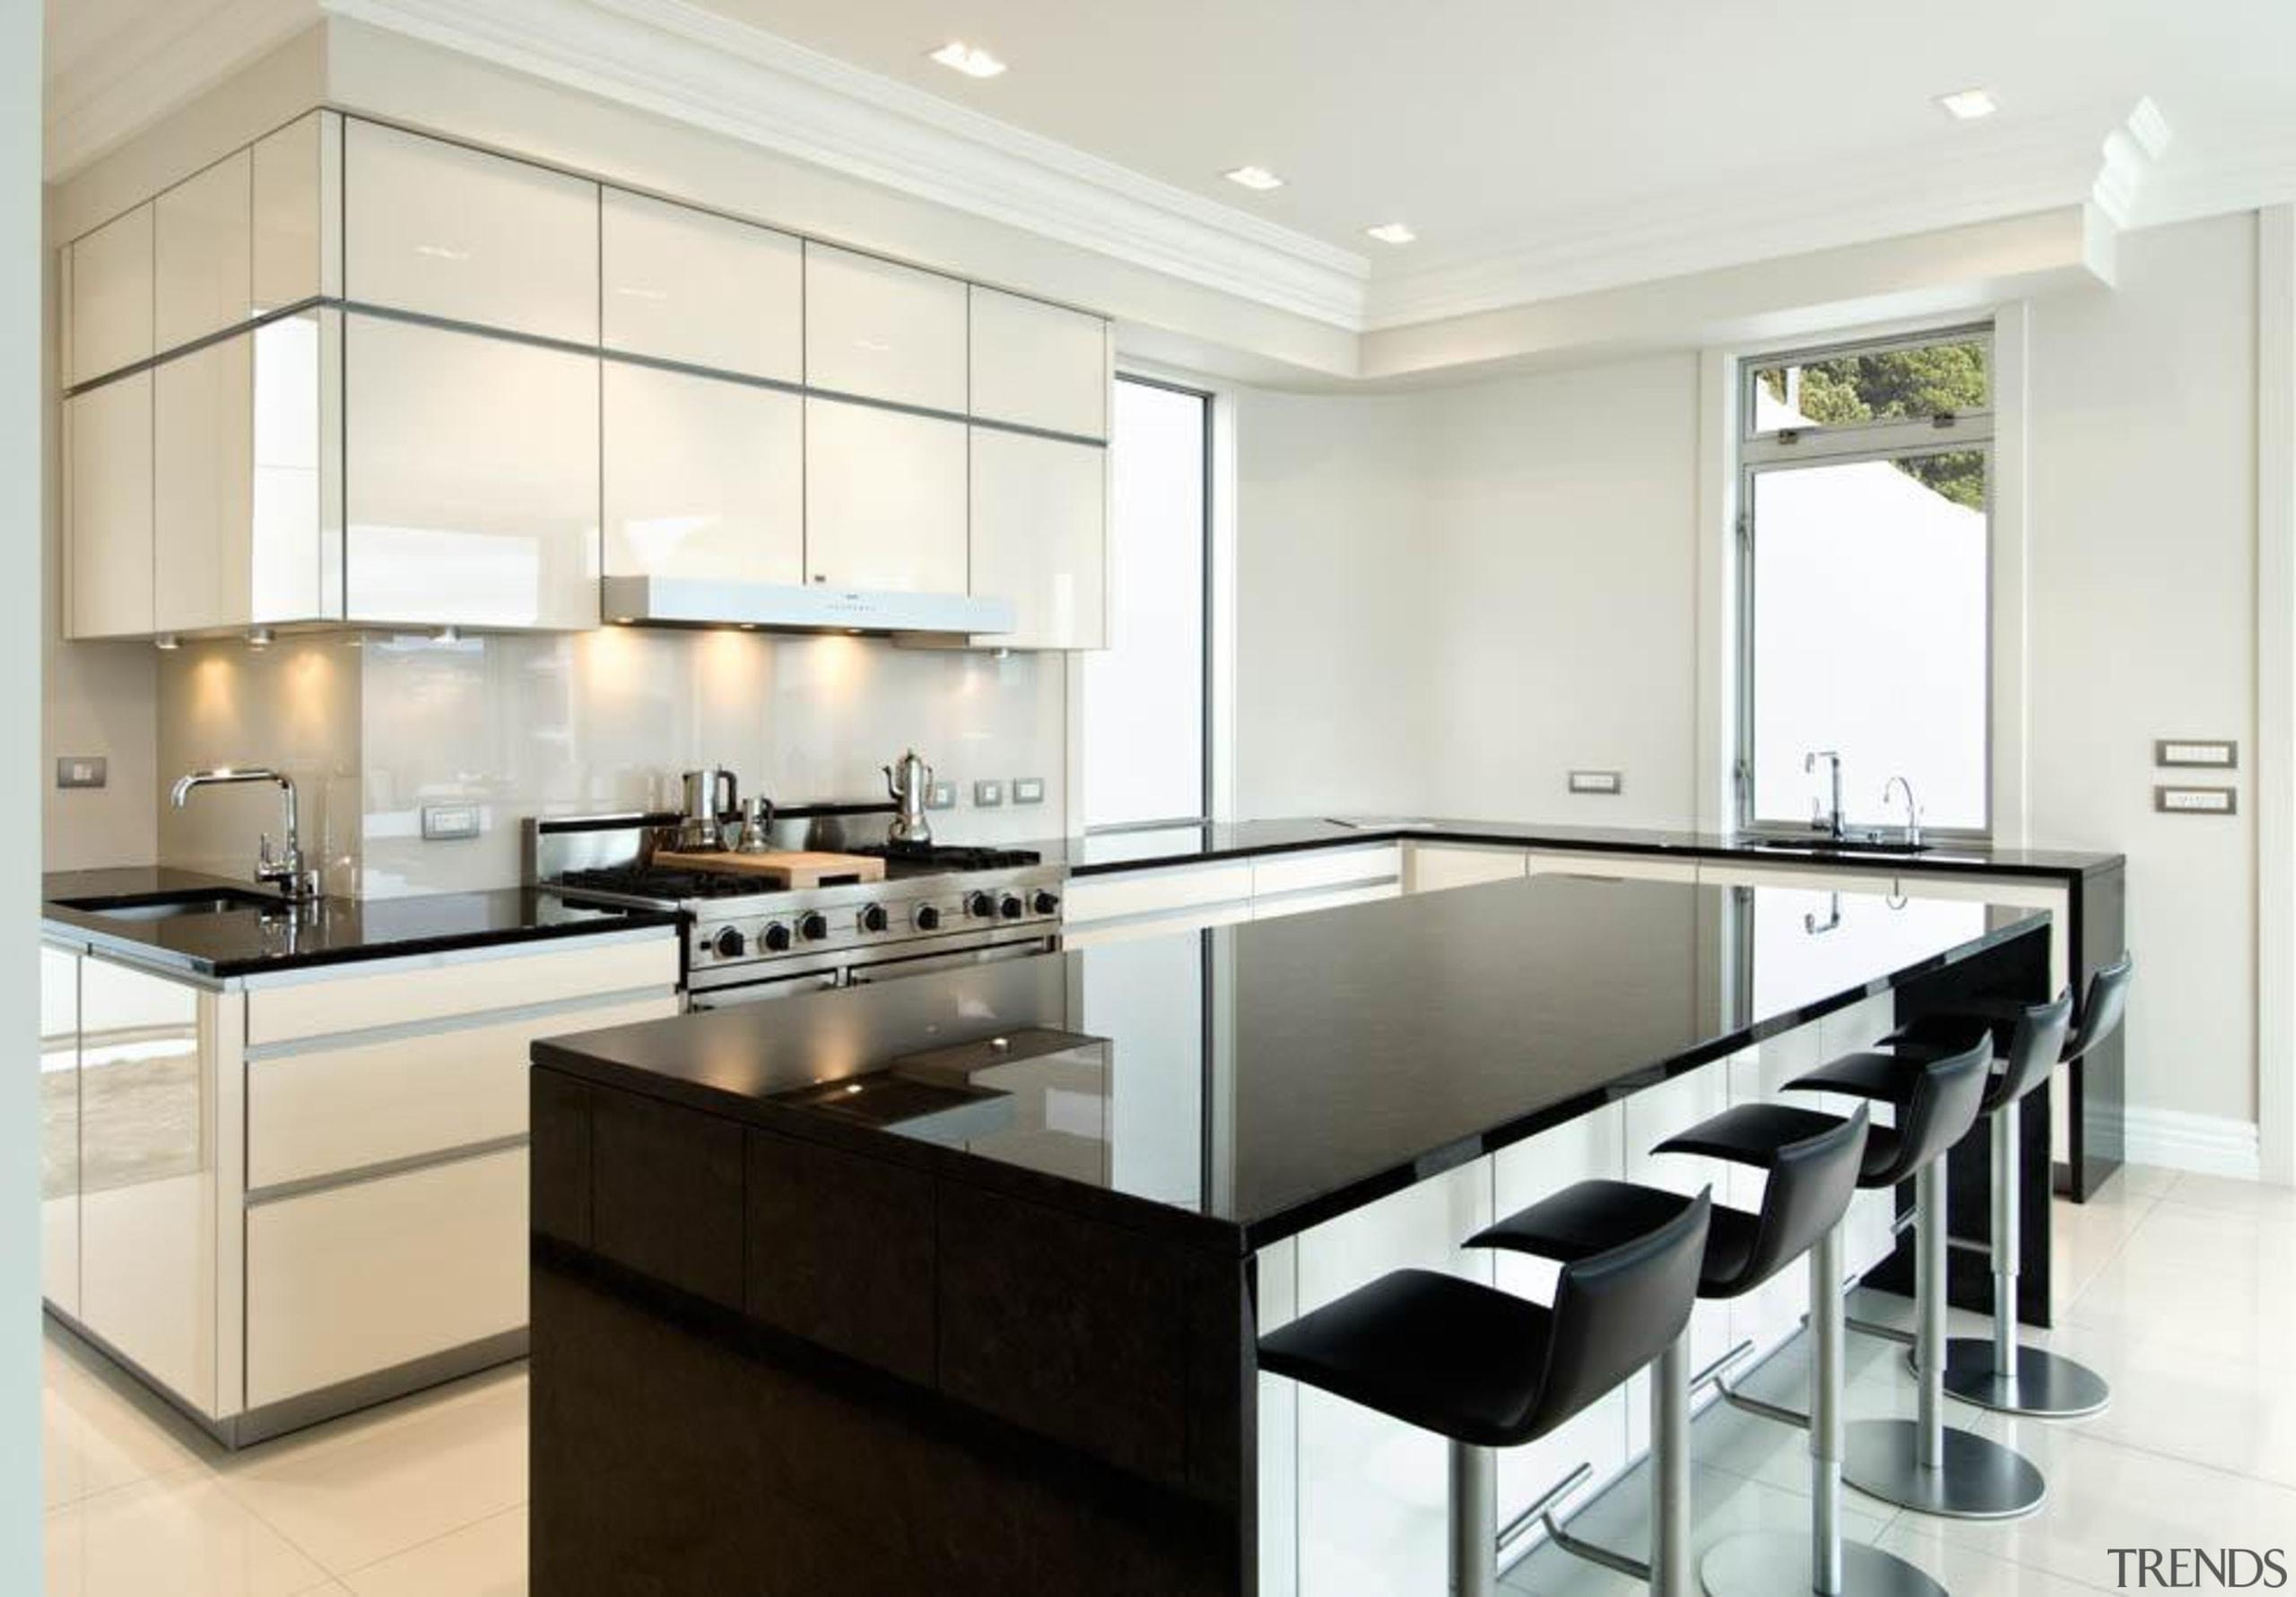 Wellington Kitchen of the Year 2010 - Wellington countertop, cuisine classique, interior design, kitchen, property, real estate, white